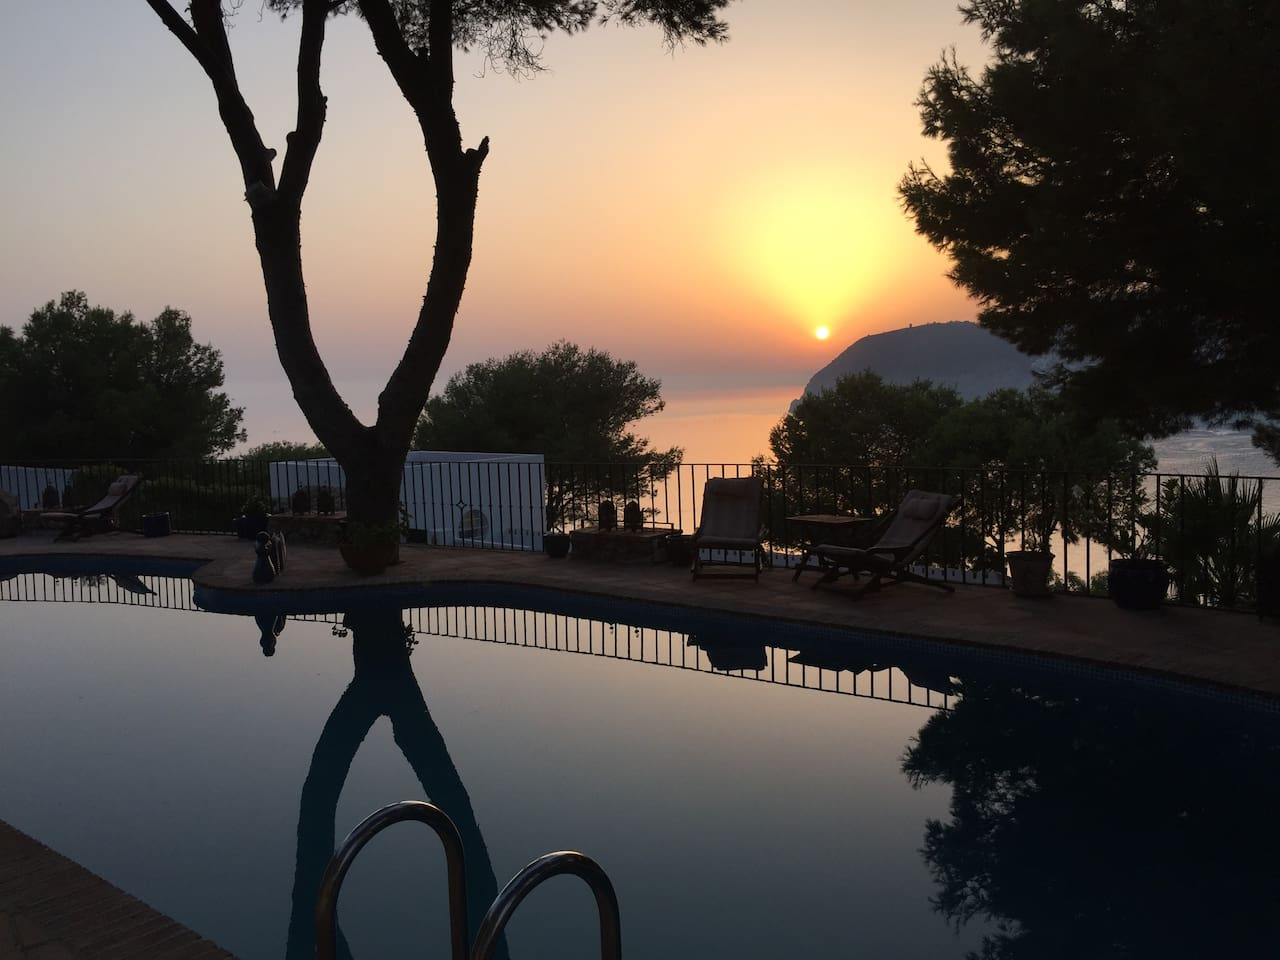 LaXana - Beautiful sunset from the pool area